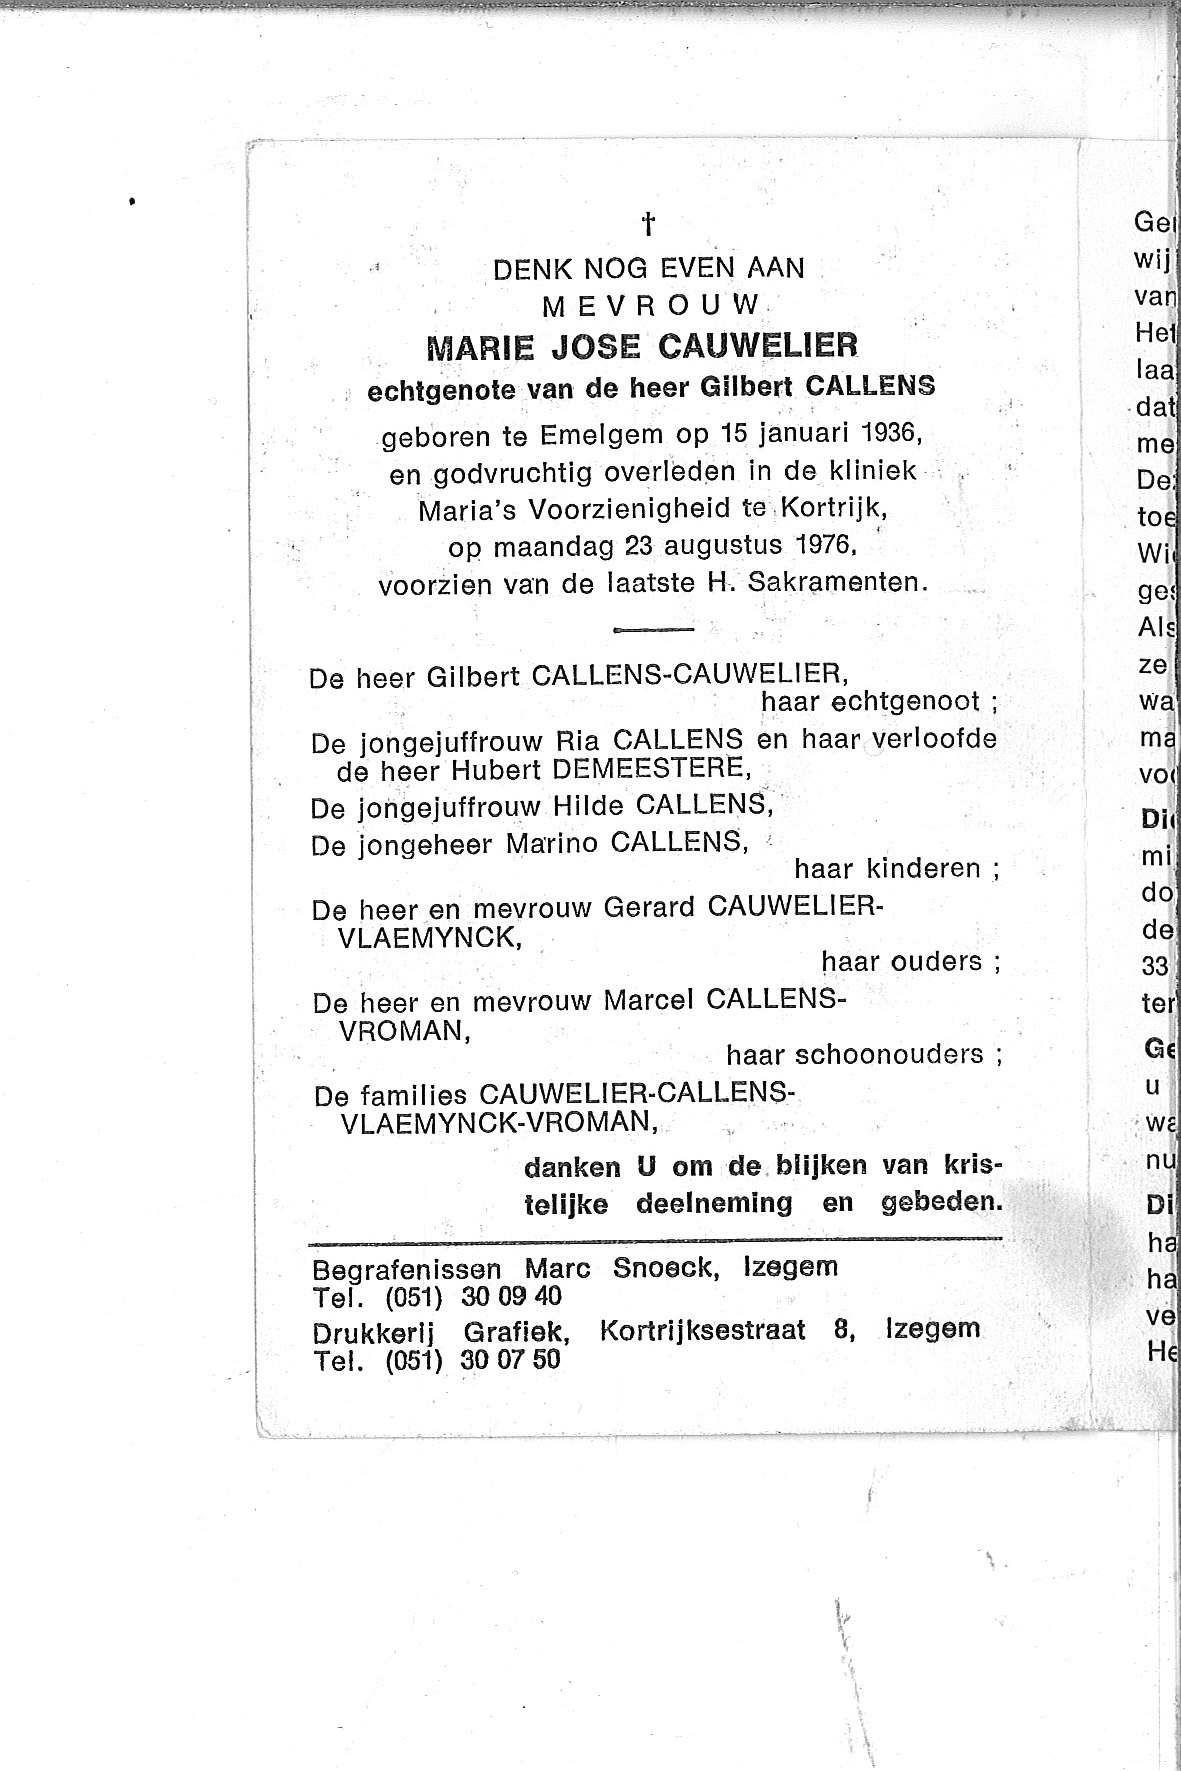 Marie-Jose(1976)20131030151636_00031.jpg